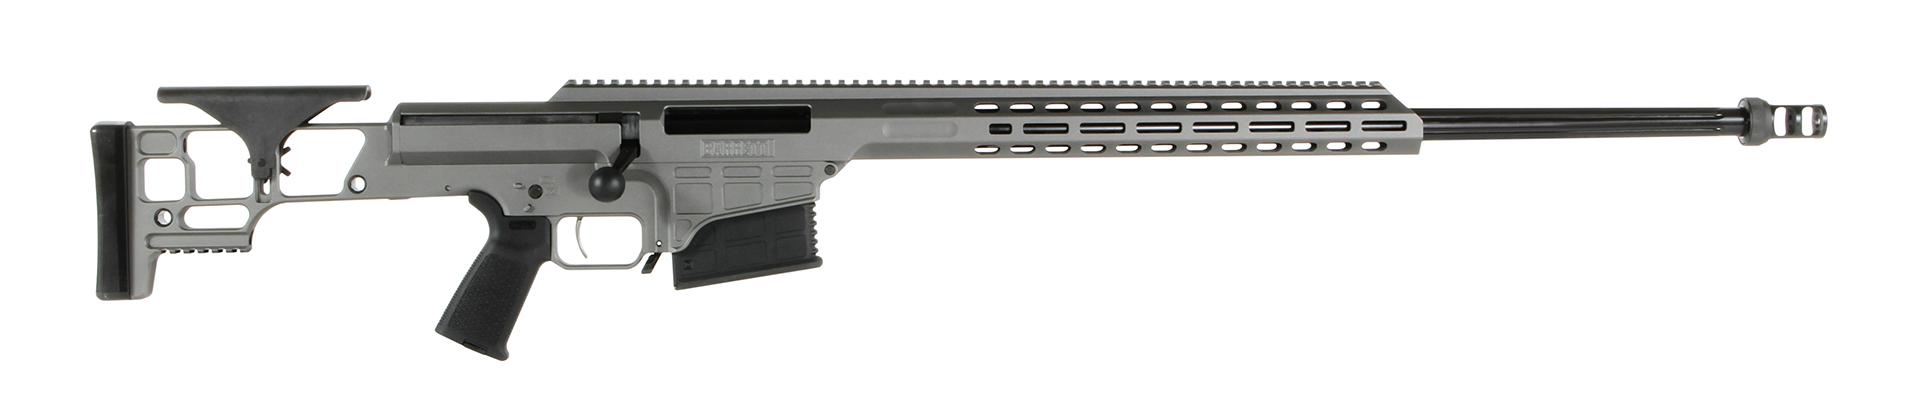 Barrett Firearms MRAD 6.5 Creedmoor